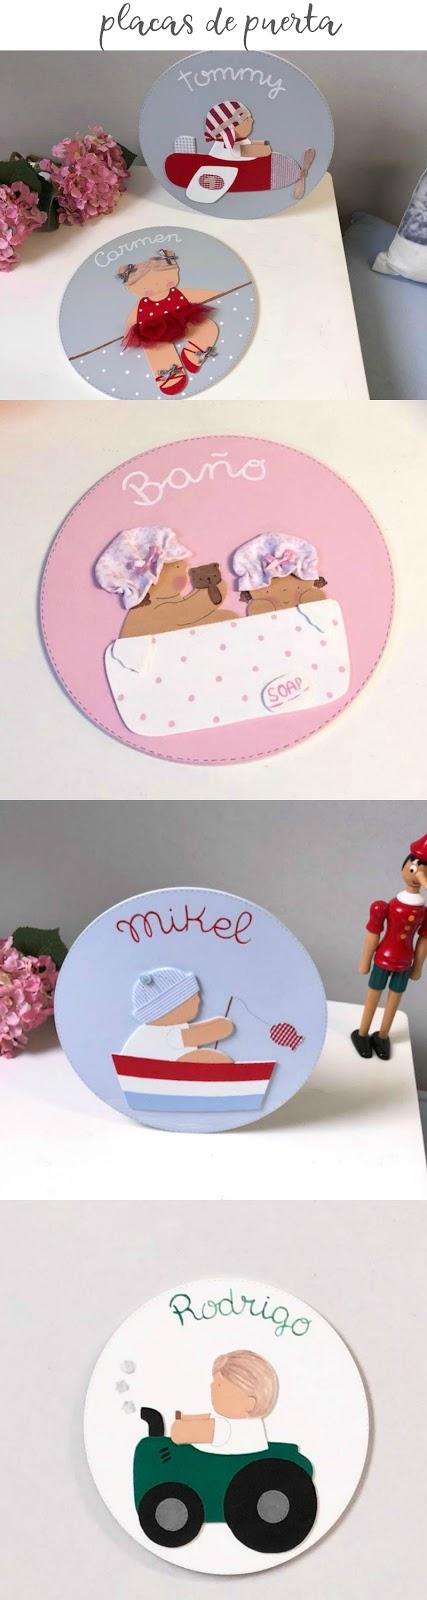 placas de puerta , carteles de puerta infantiles personalizadas